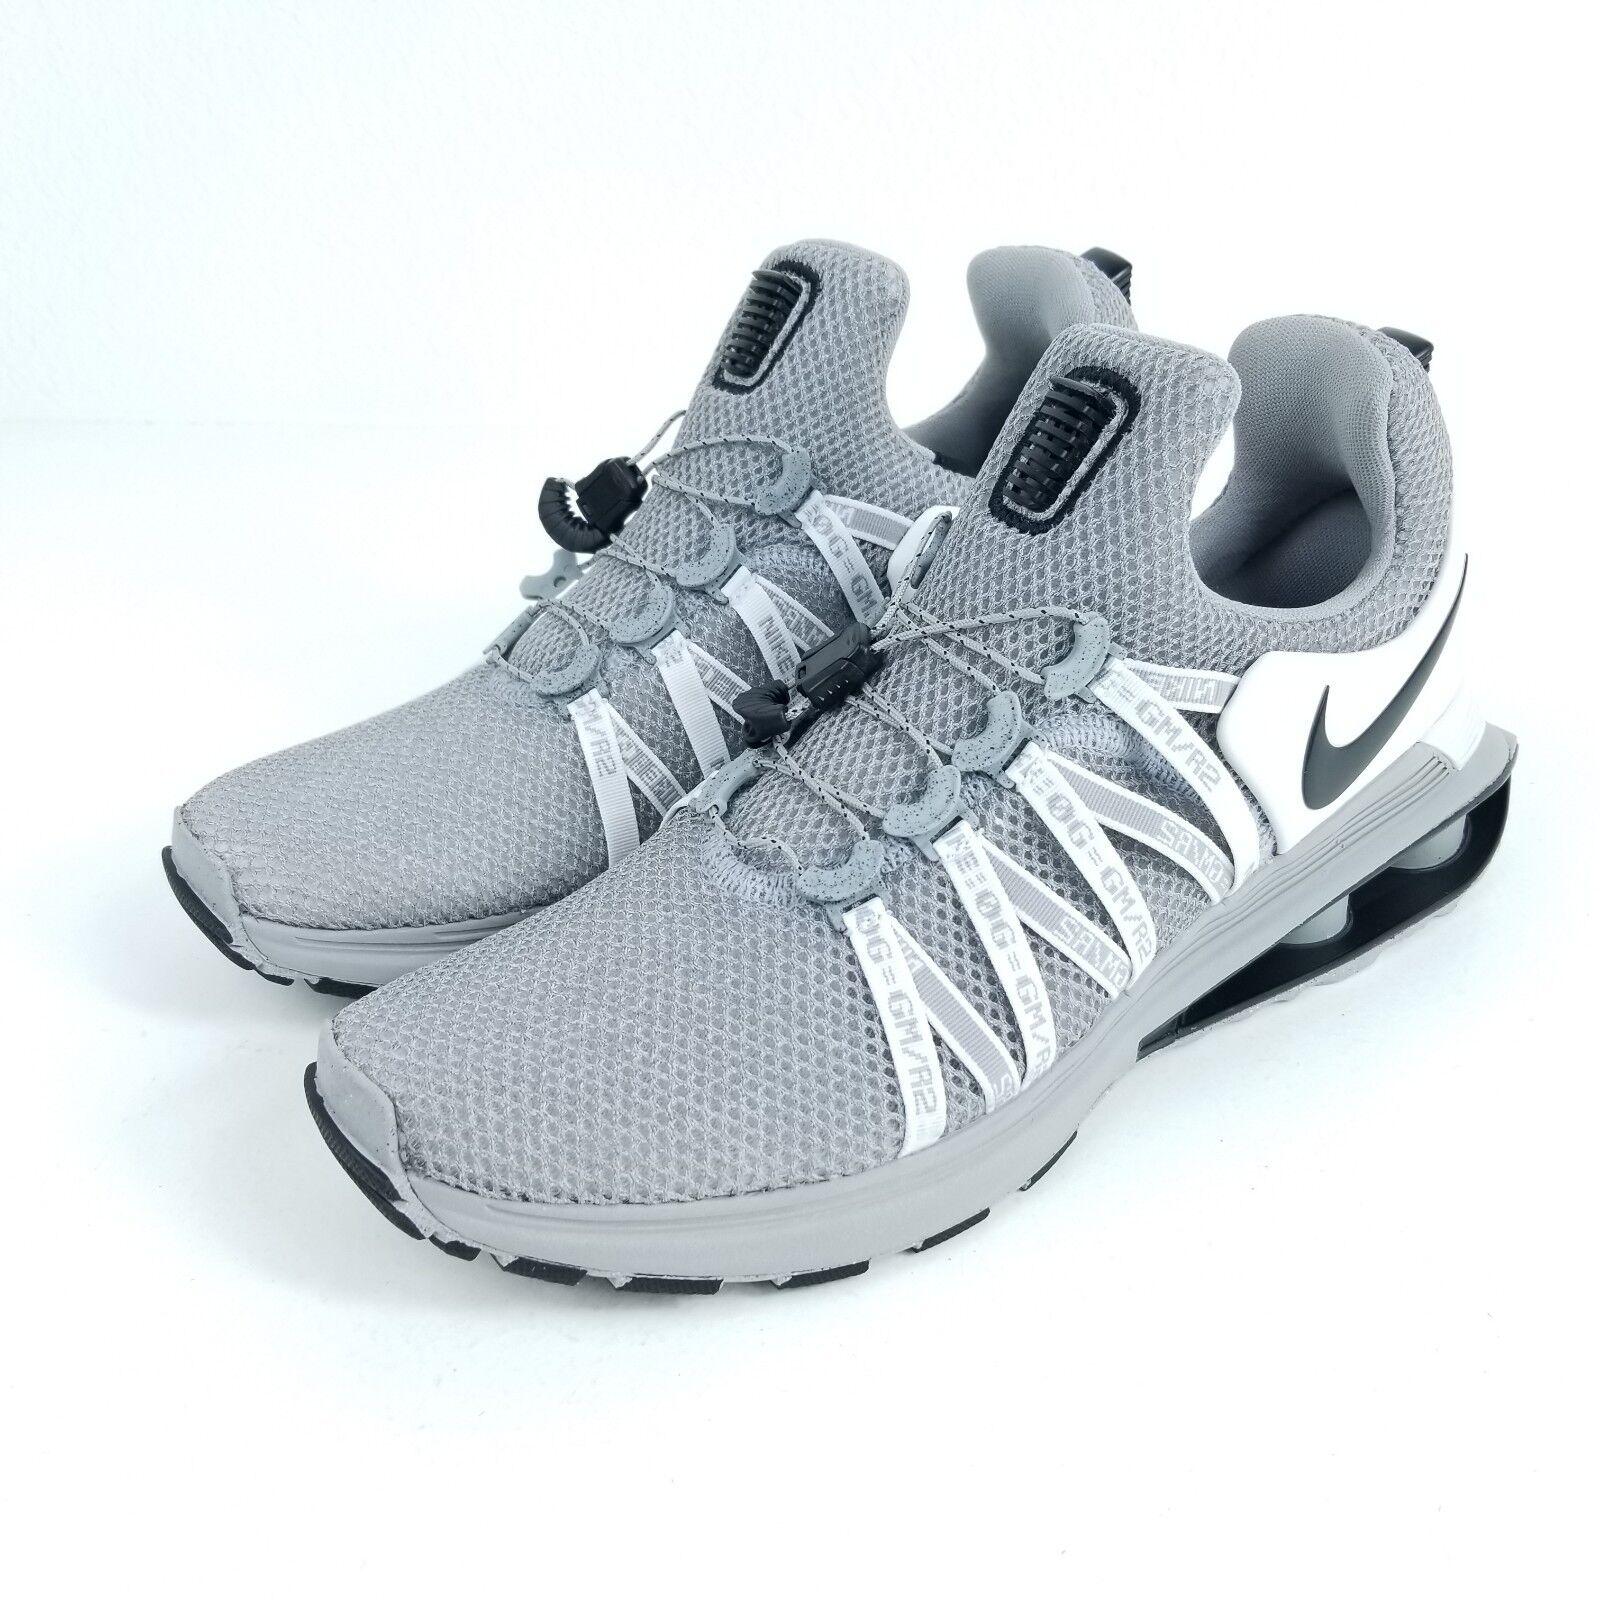 NIKE Shox Gravity Mens Sz Multiple Shoes OG Wolf Grey Black AR1999 010